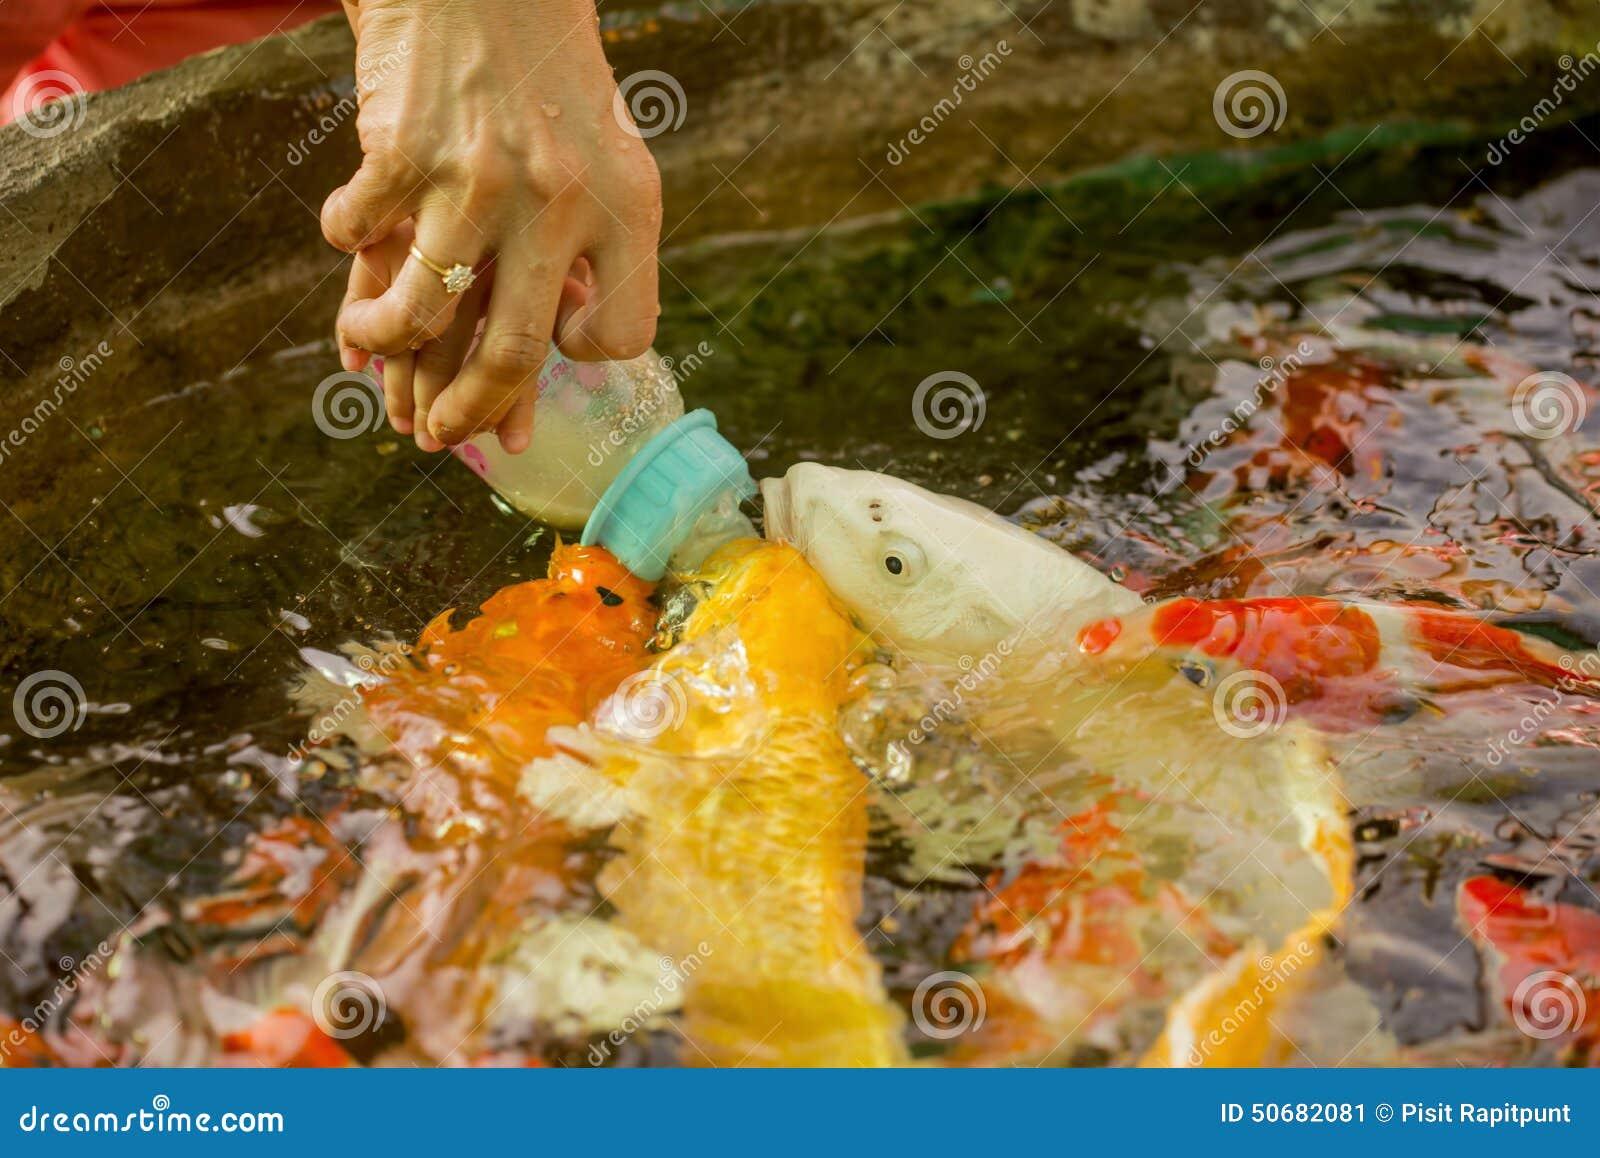 Download 哺养的饥饿的花梢鲤鱼在水池钓鱼 库存图片. 图片 包括有 橙色, 日本, 岩石, 室外, 阳光, 聚会所 - 50682081